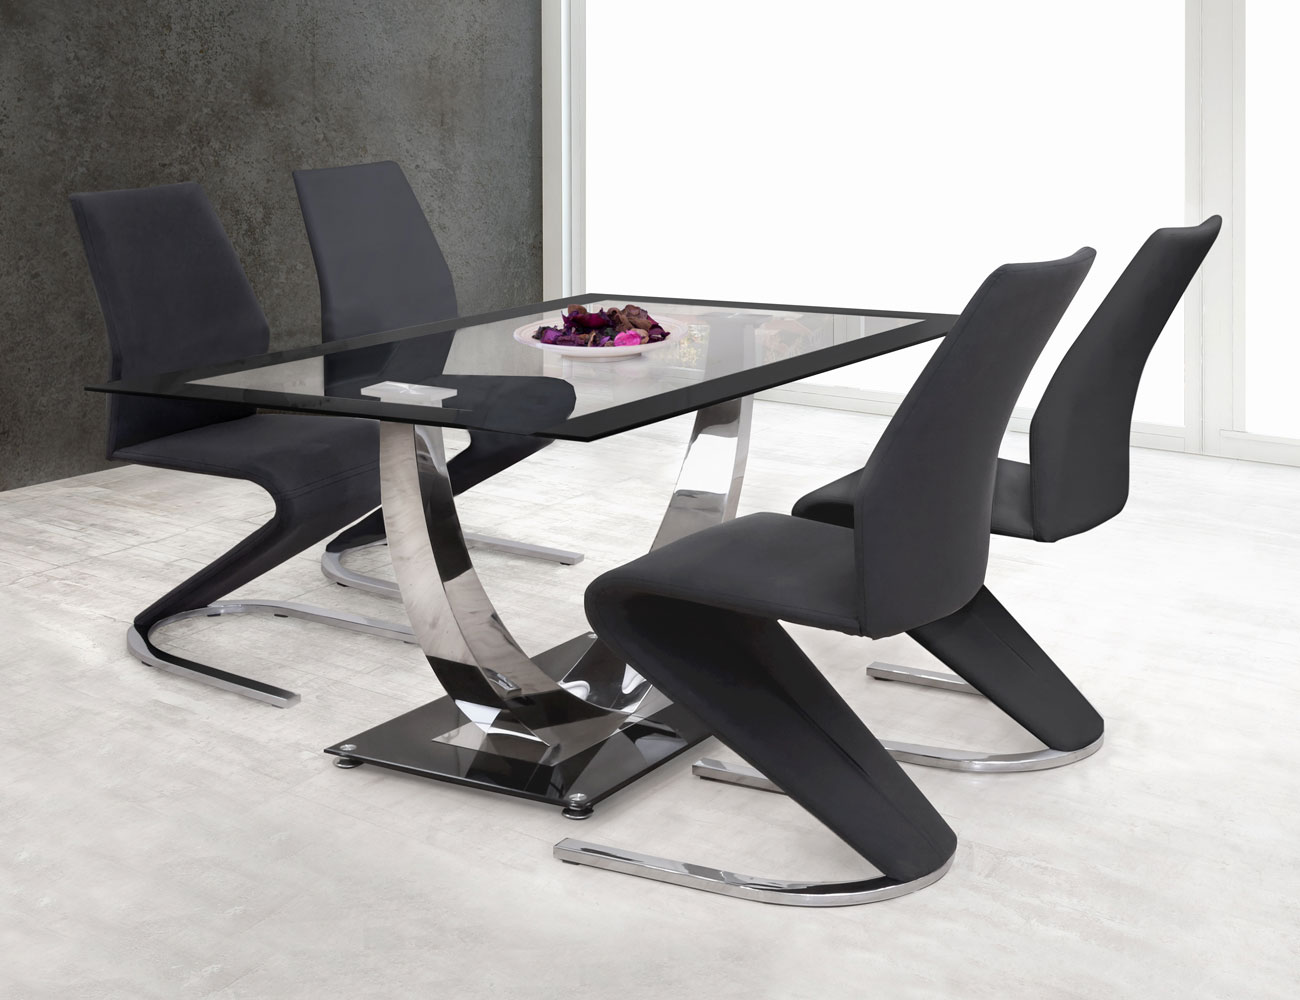 Mesa cocina cristal templado negra 282 3861